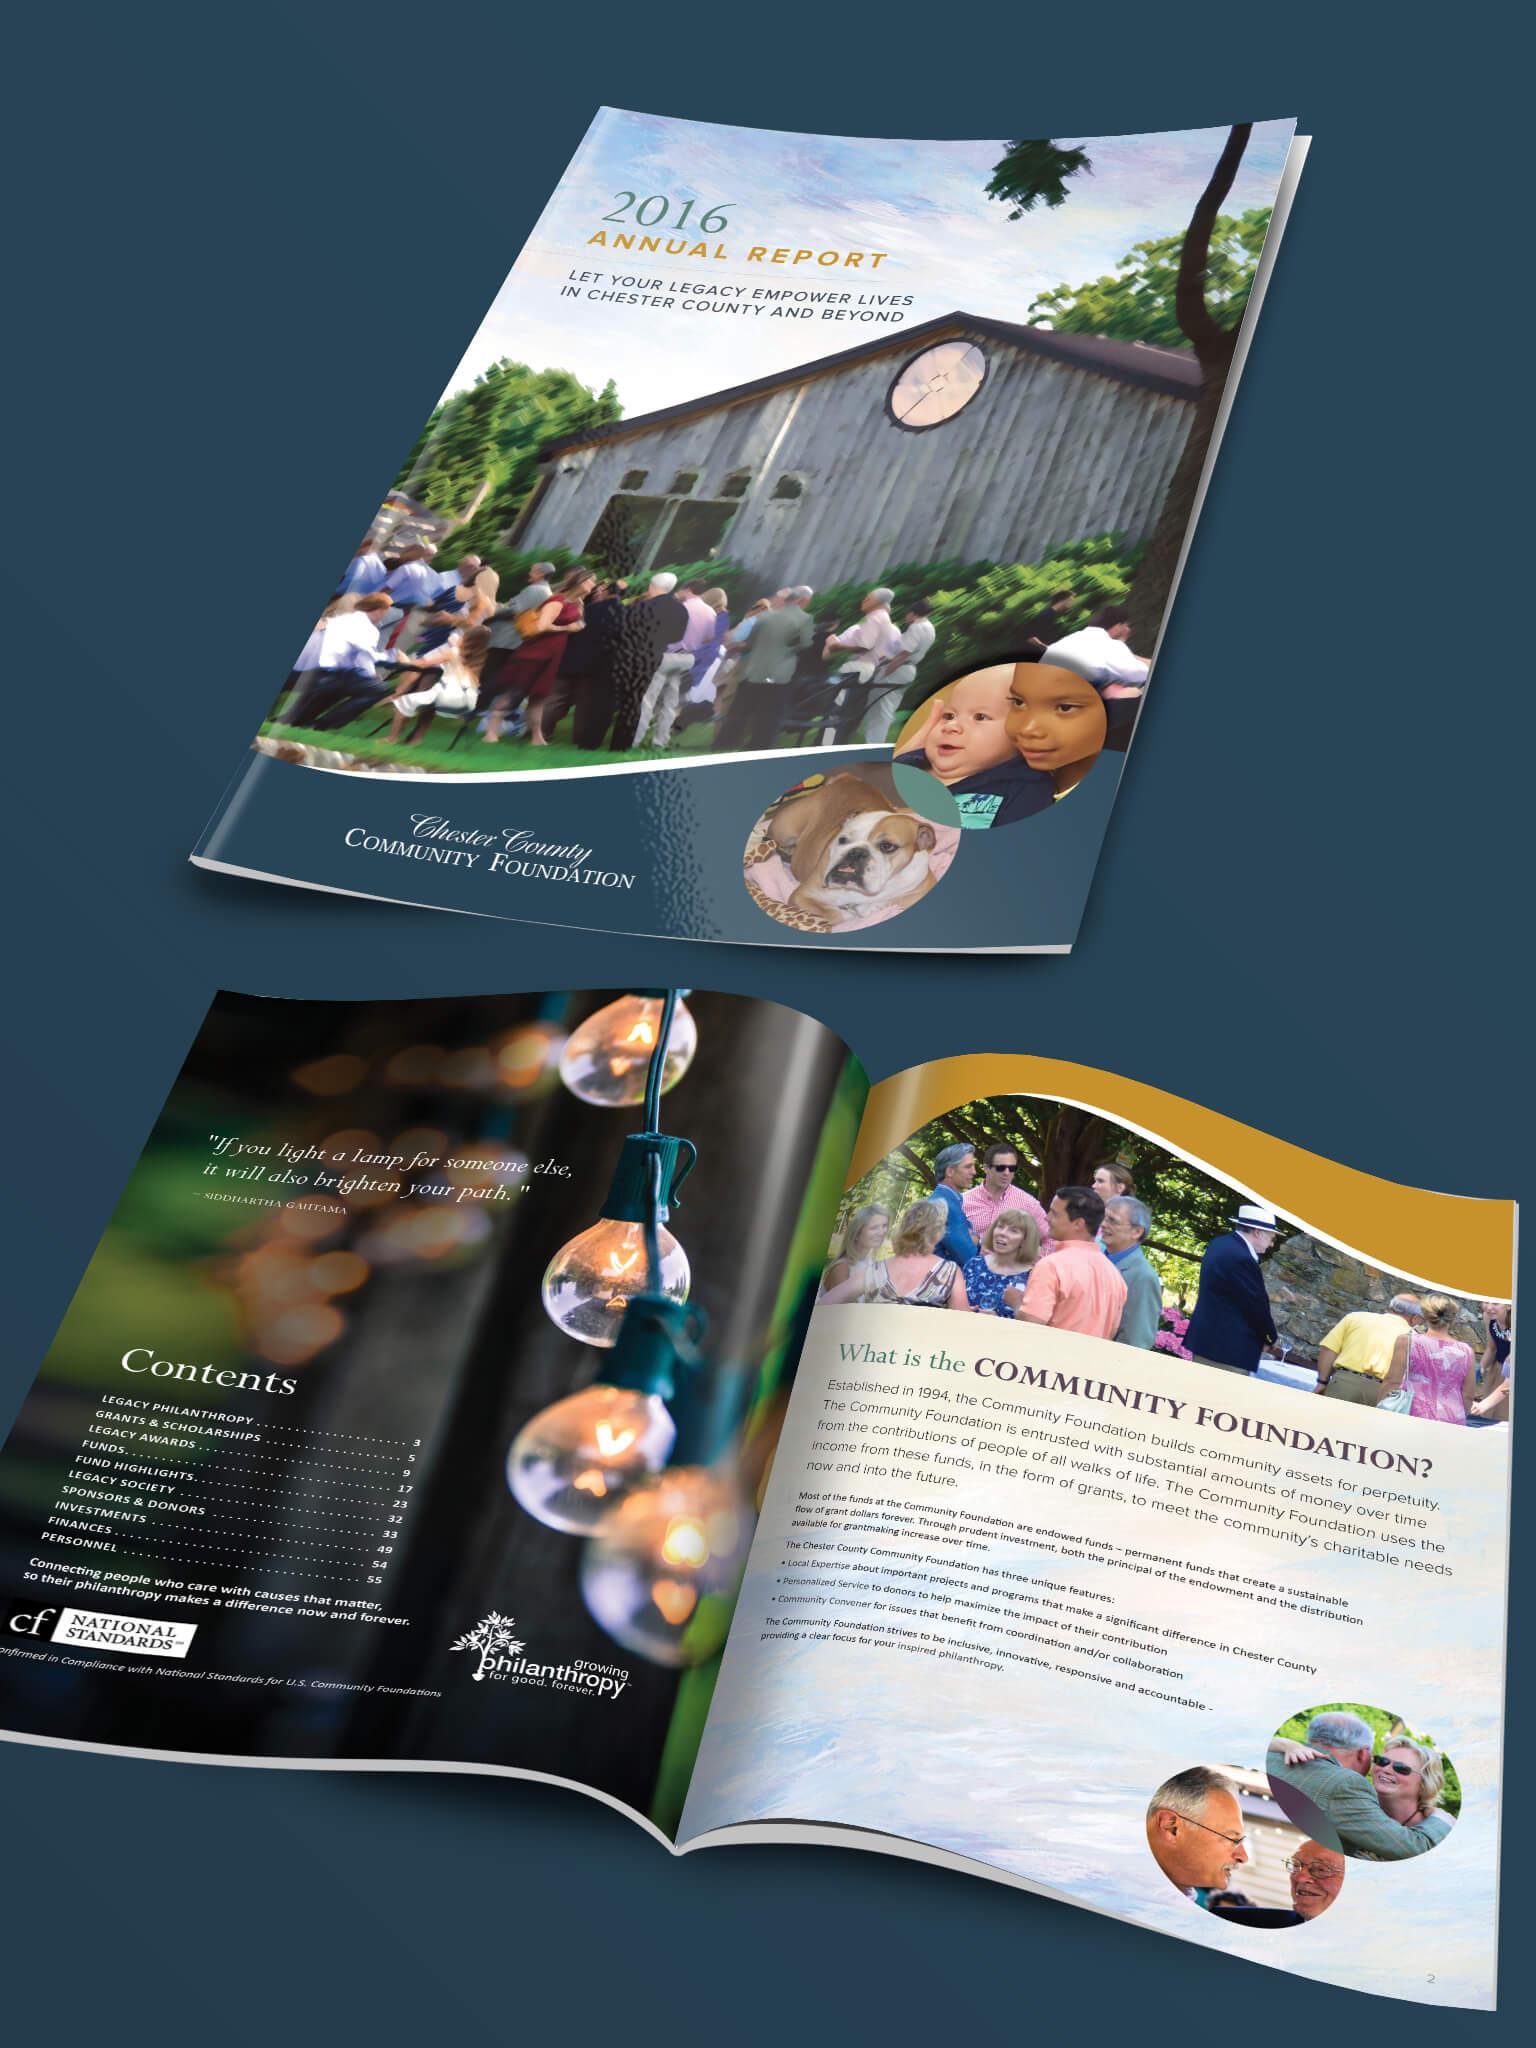 Annual Report Design for Nonprofit